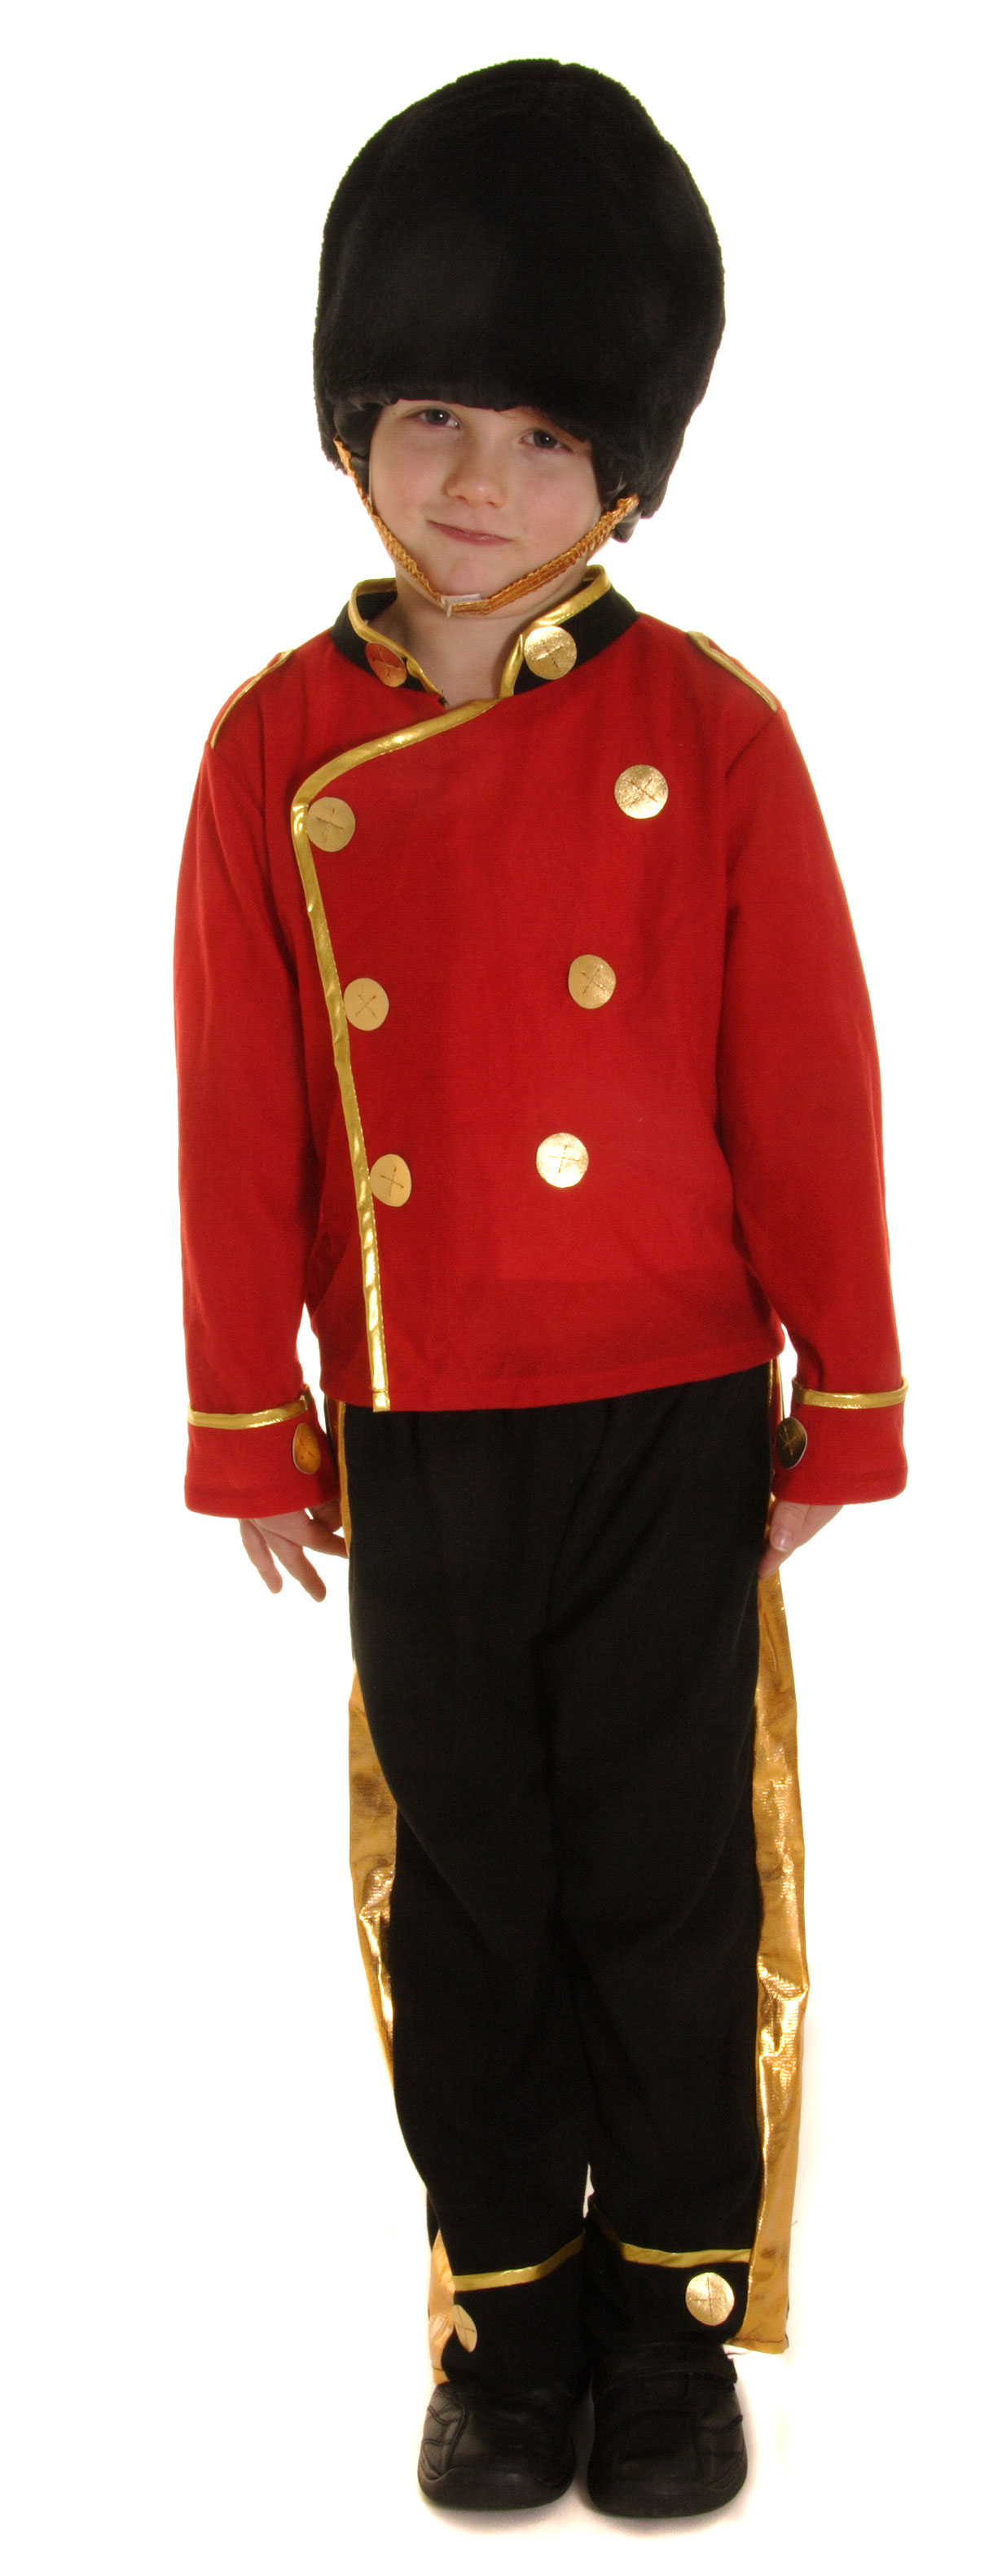 British Royal Guard Uniform 93